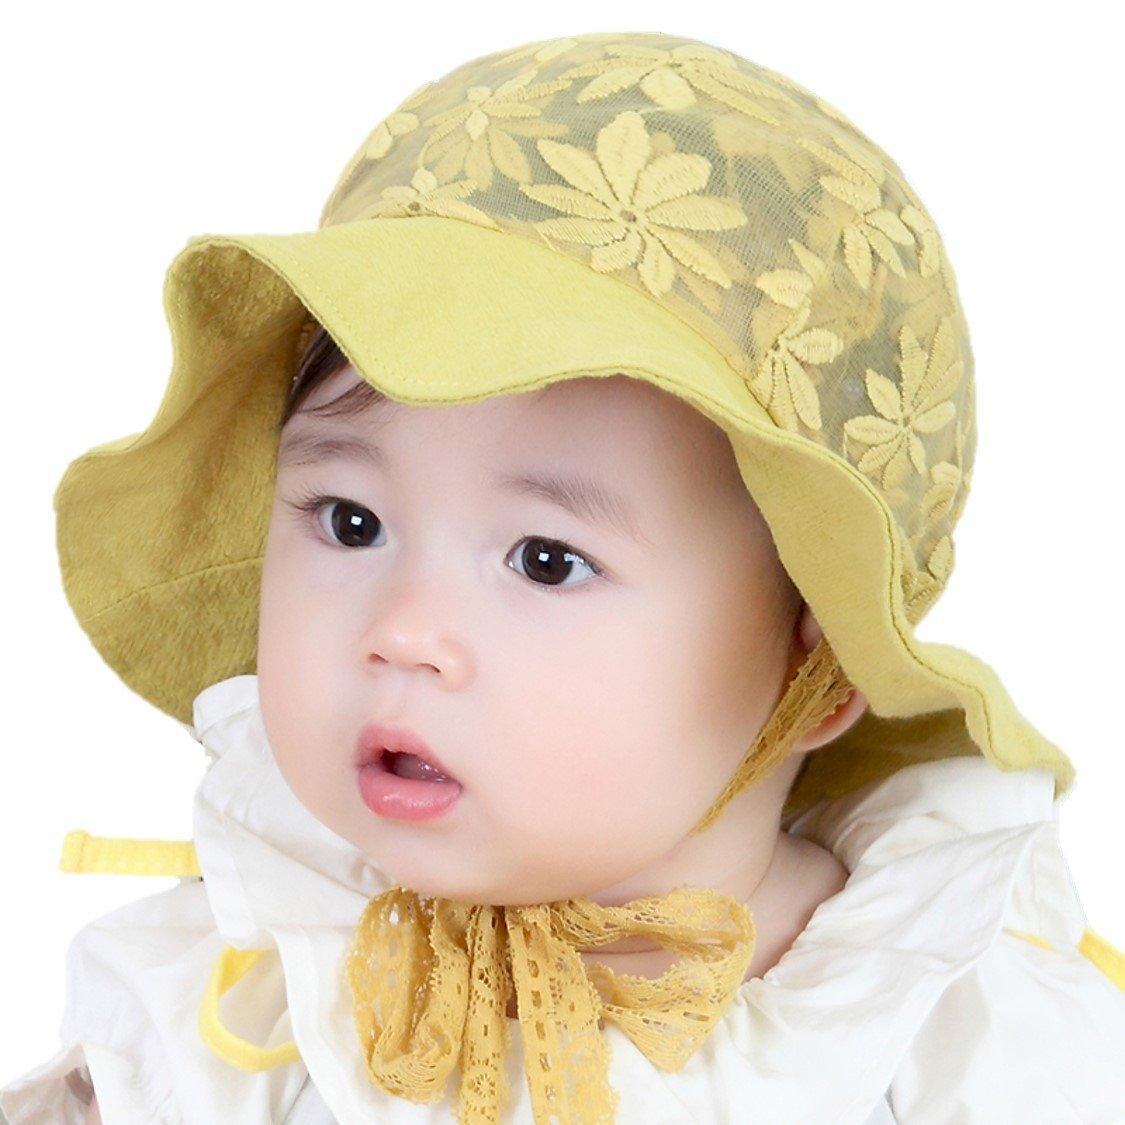 b0295f5d4 iHomey Baby Toddler Girls Large Brim Sun Hat With Chin Strap Cotton ...